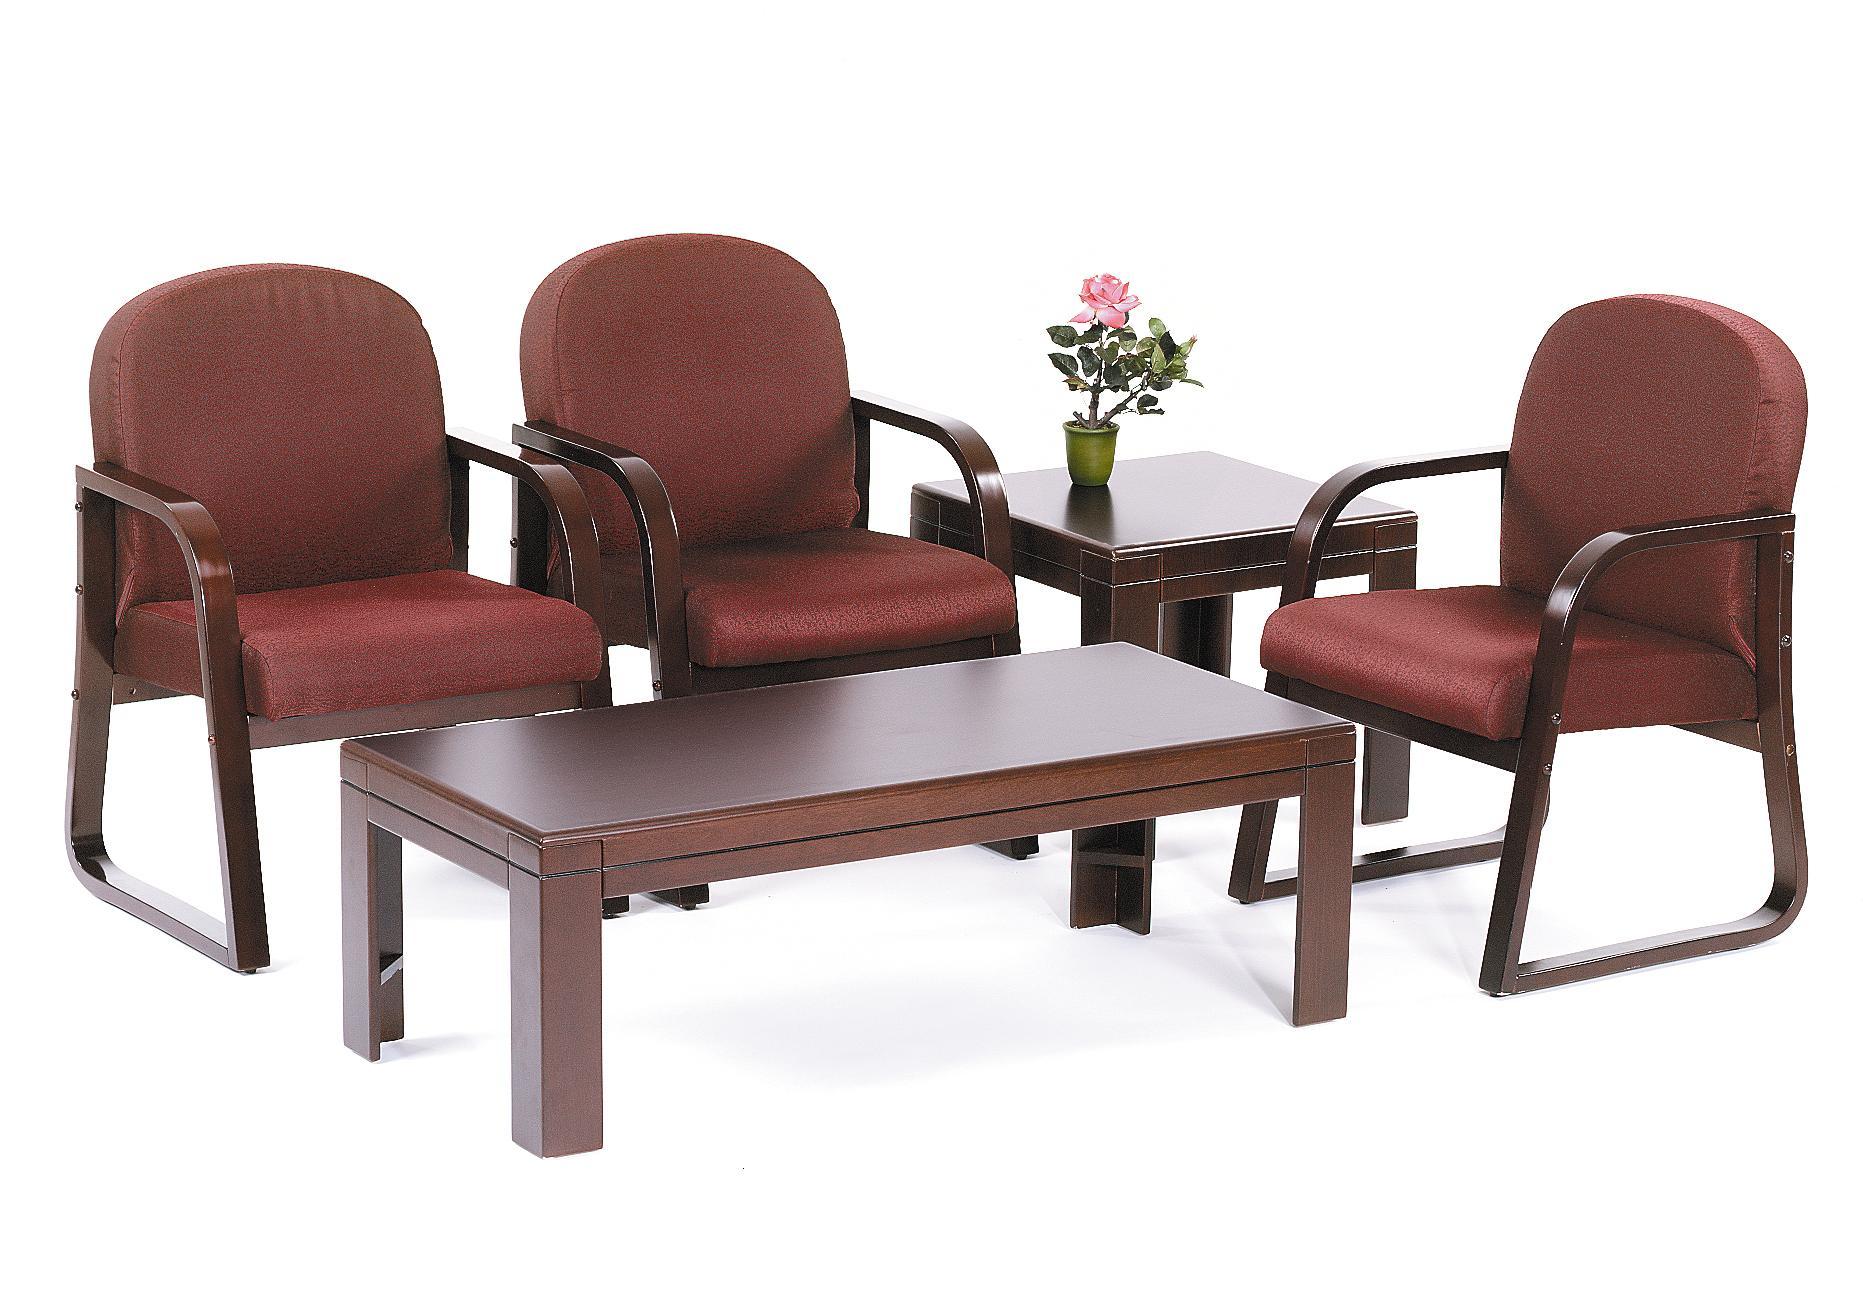 Boss Mahogany Frame Side Chair In Burgundy Fabric Bosschair